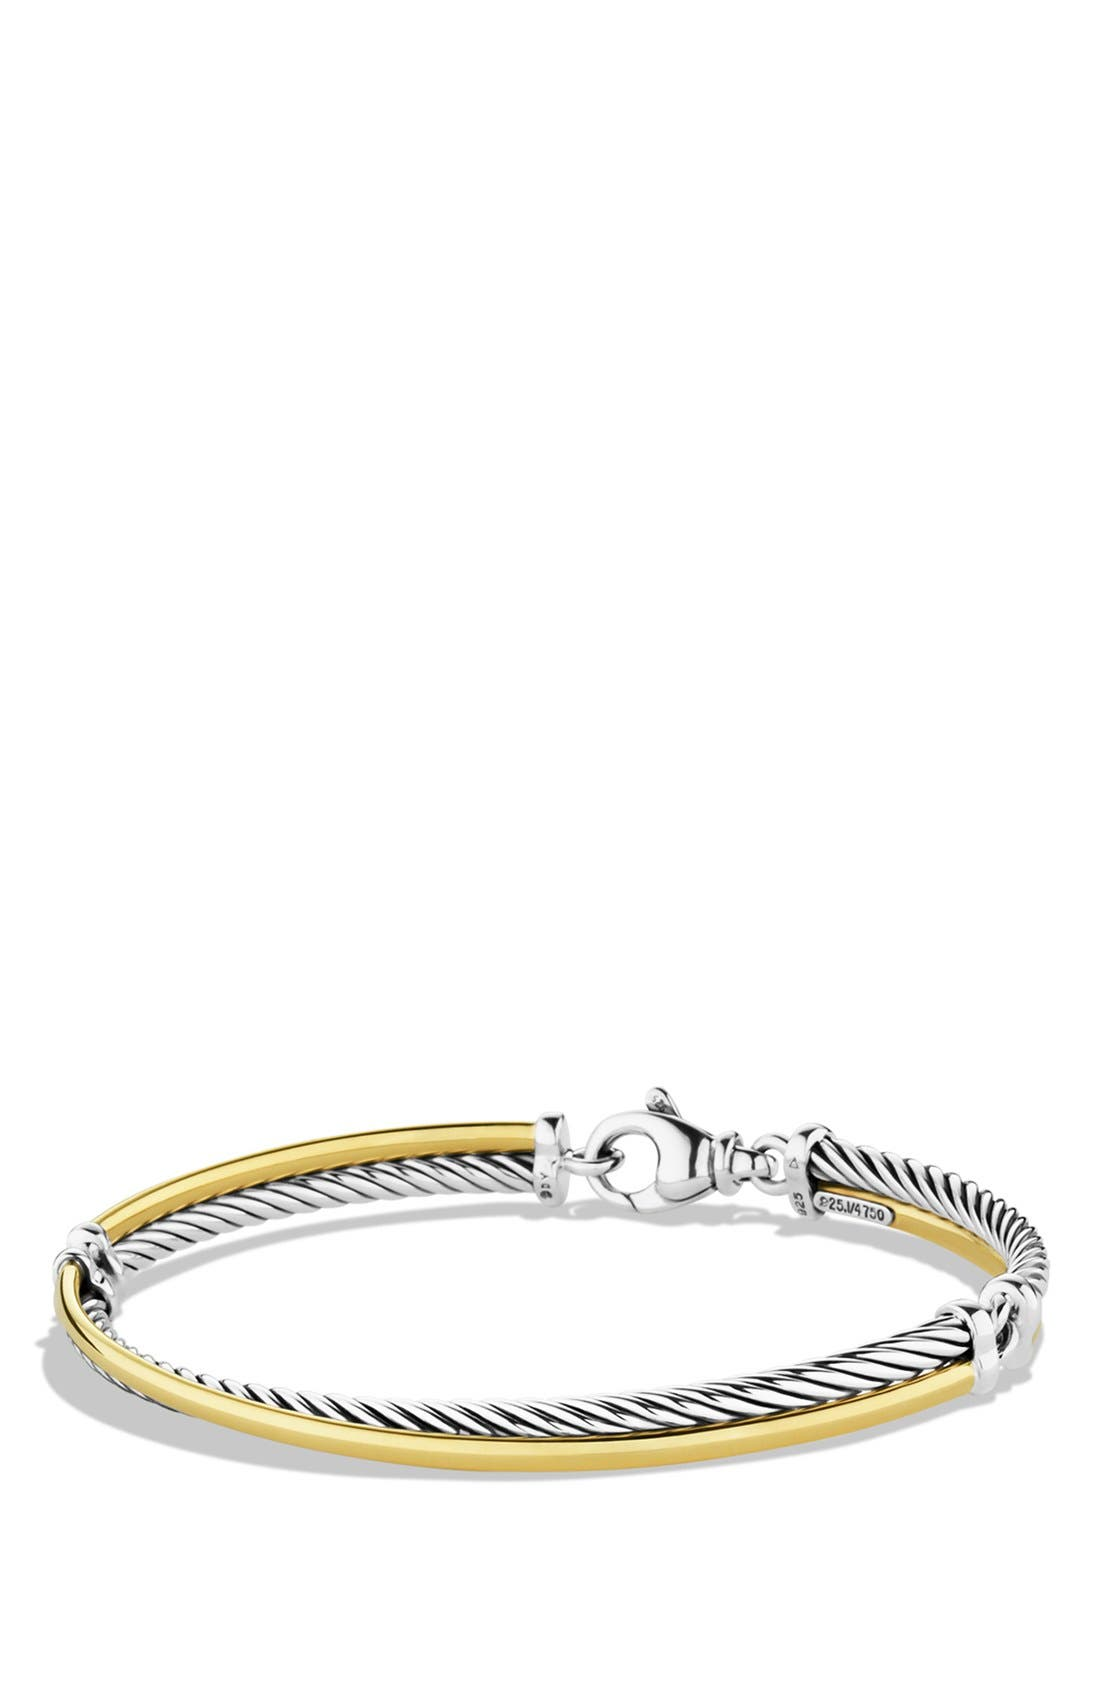 DAVID YURMAN Crossover Bracelet with Gold